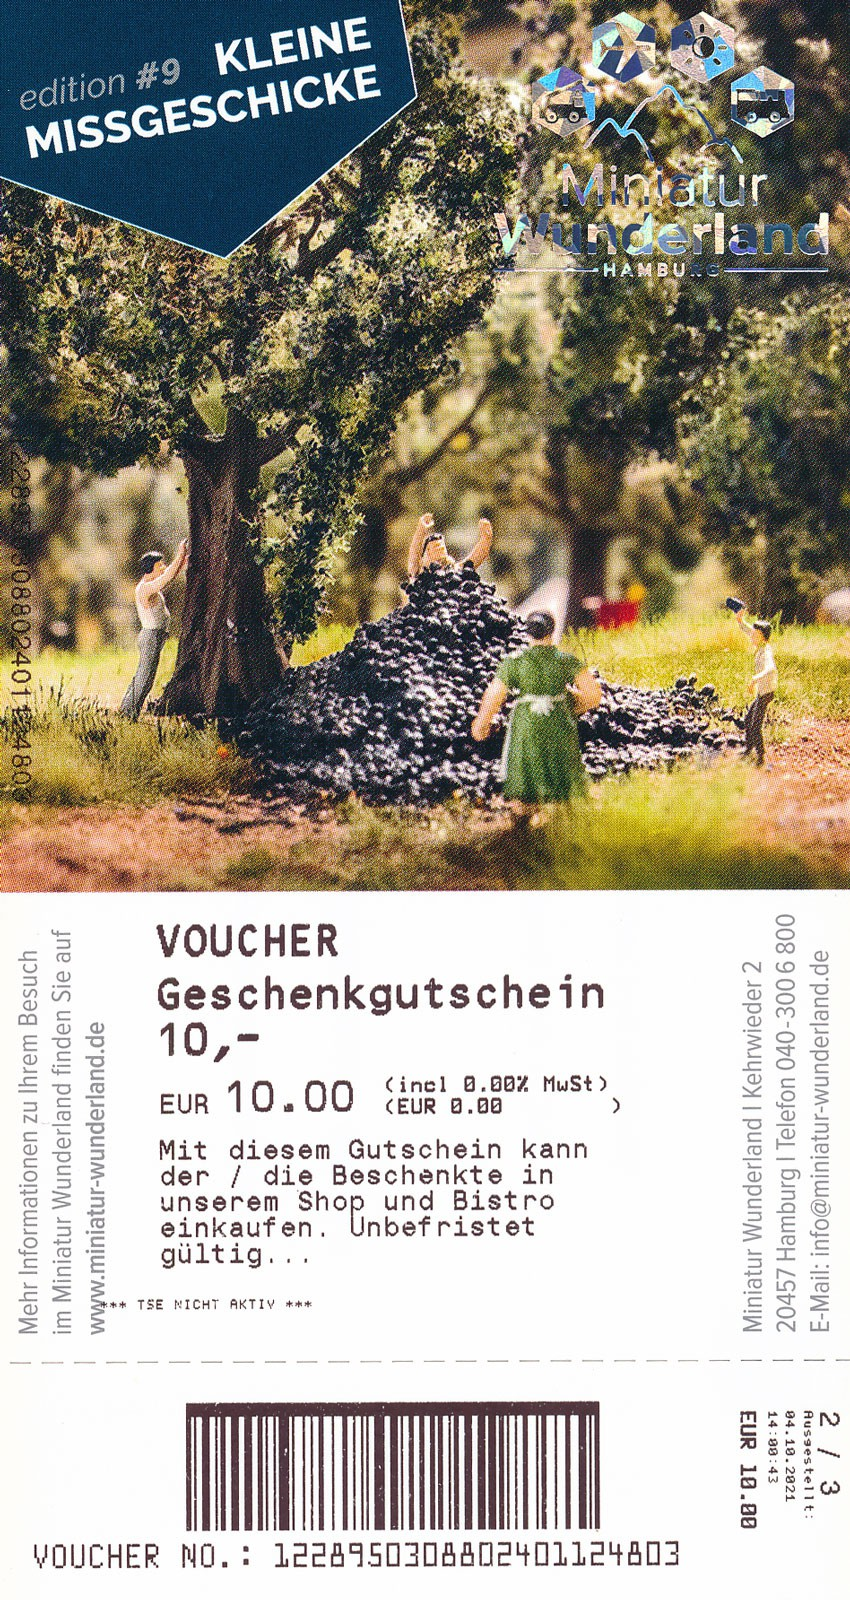 10 € Gift Voucher for Shop or Bistro